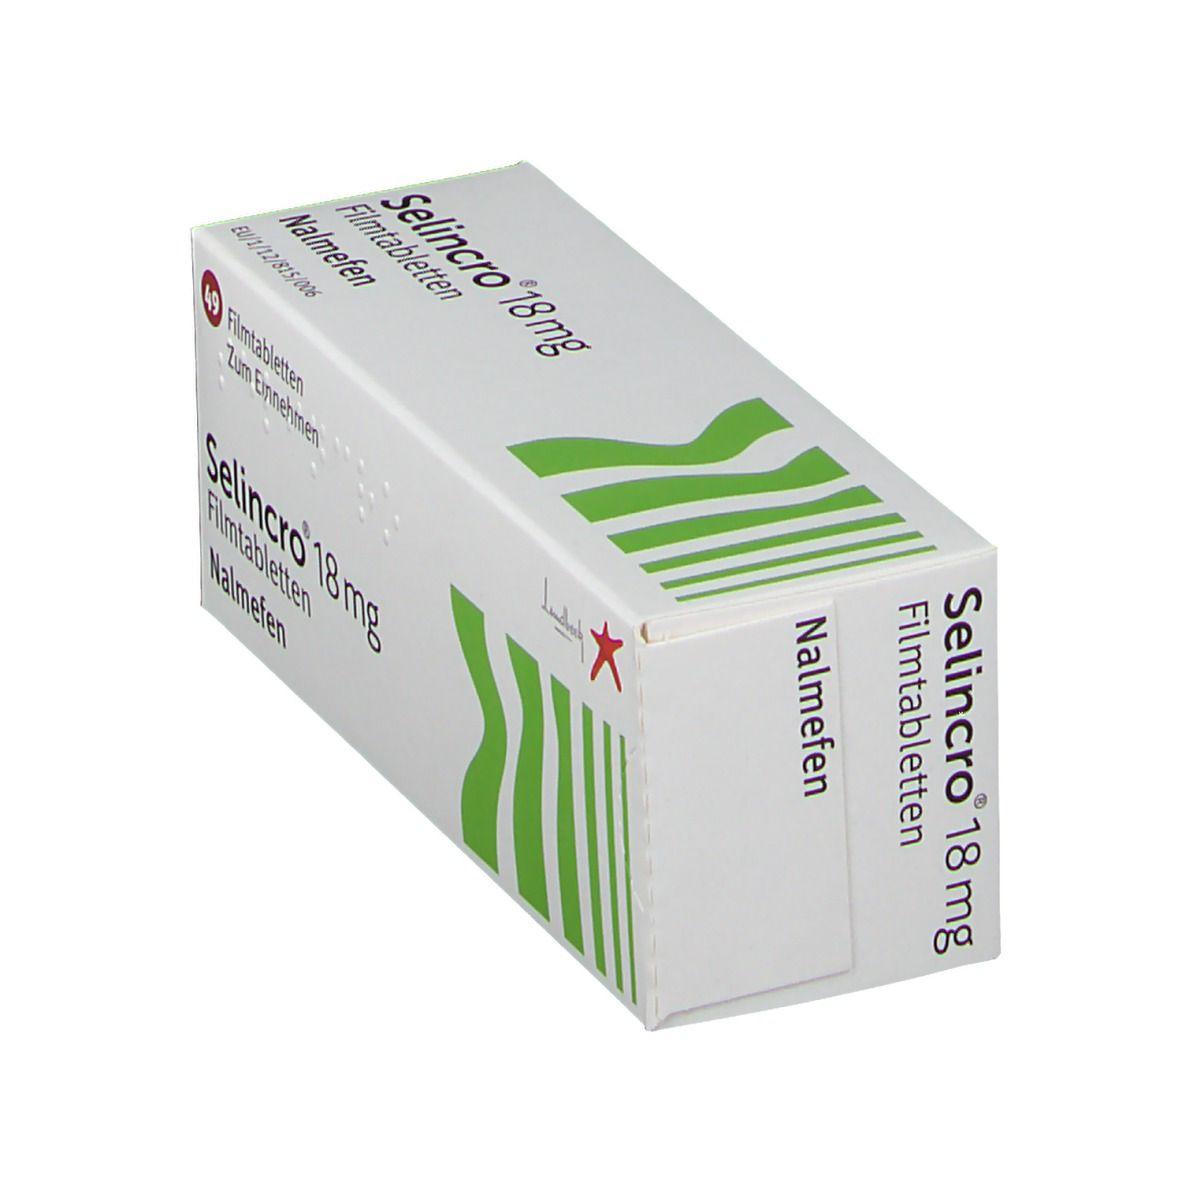 SELINCRO 18 mg Filmtabletten 49 St - shop-apotheke.com